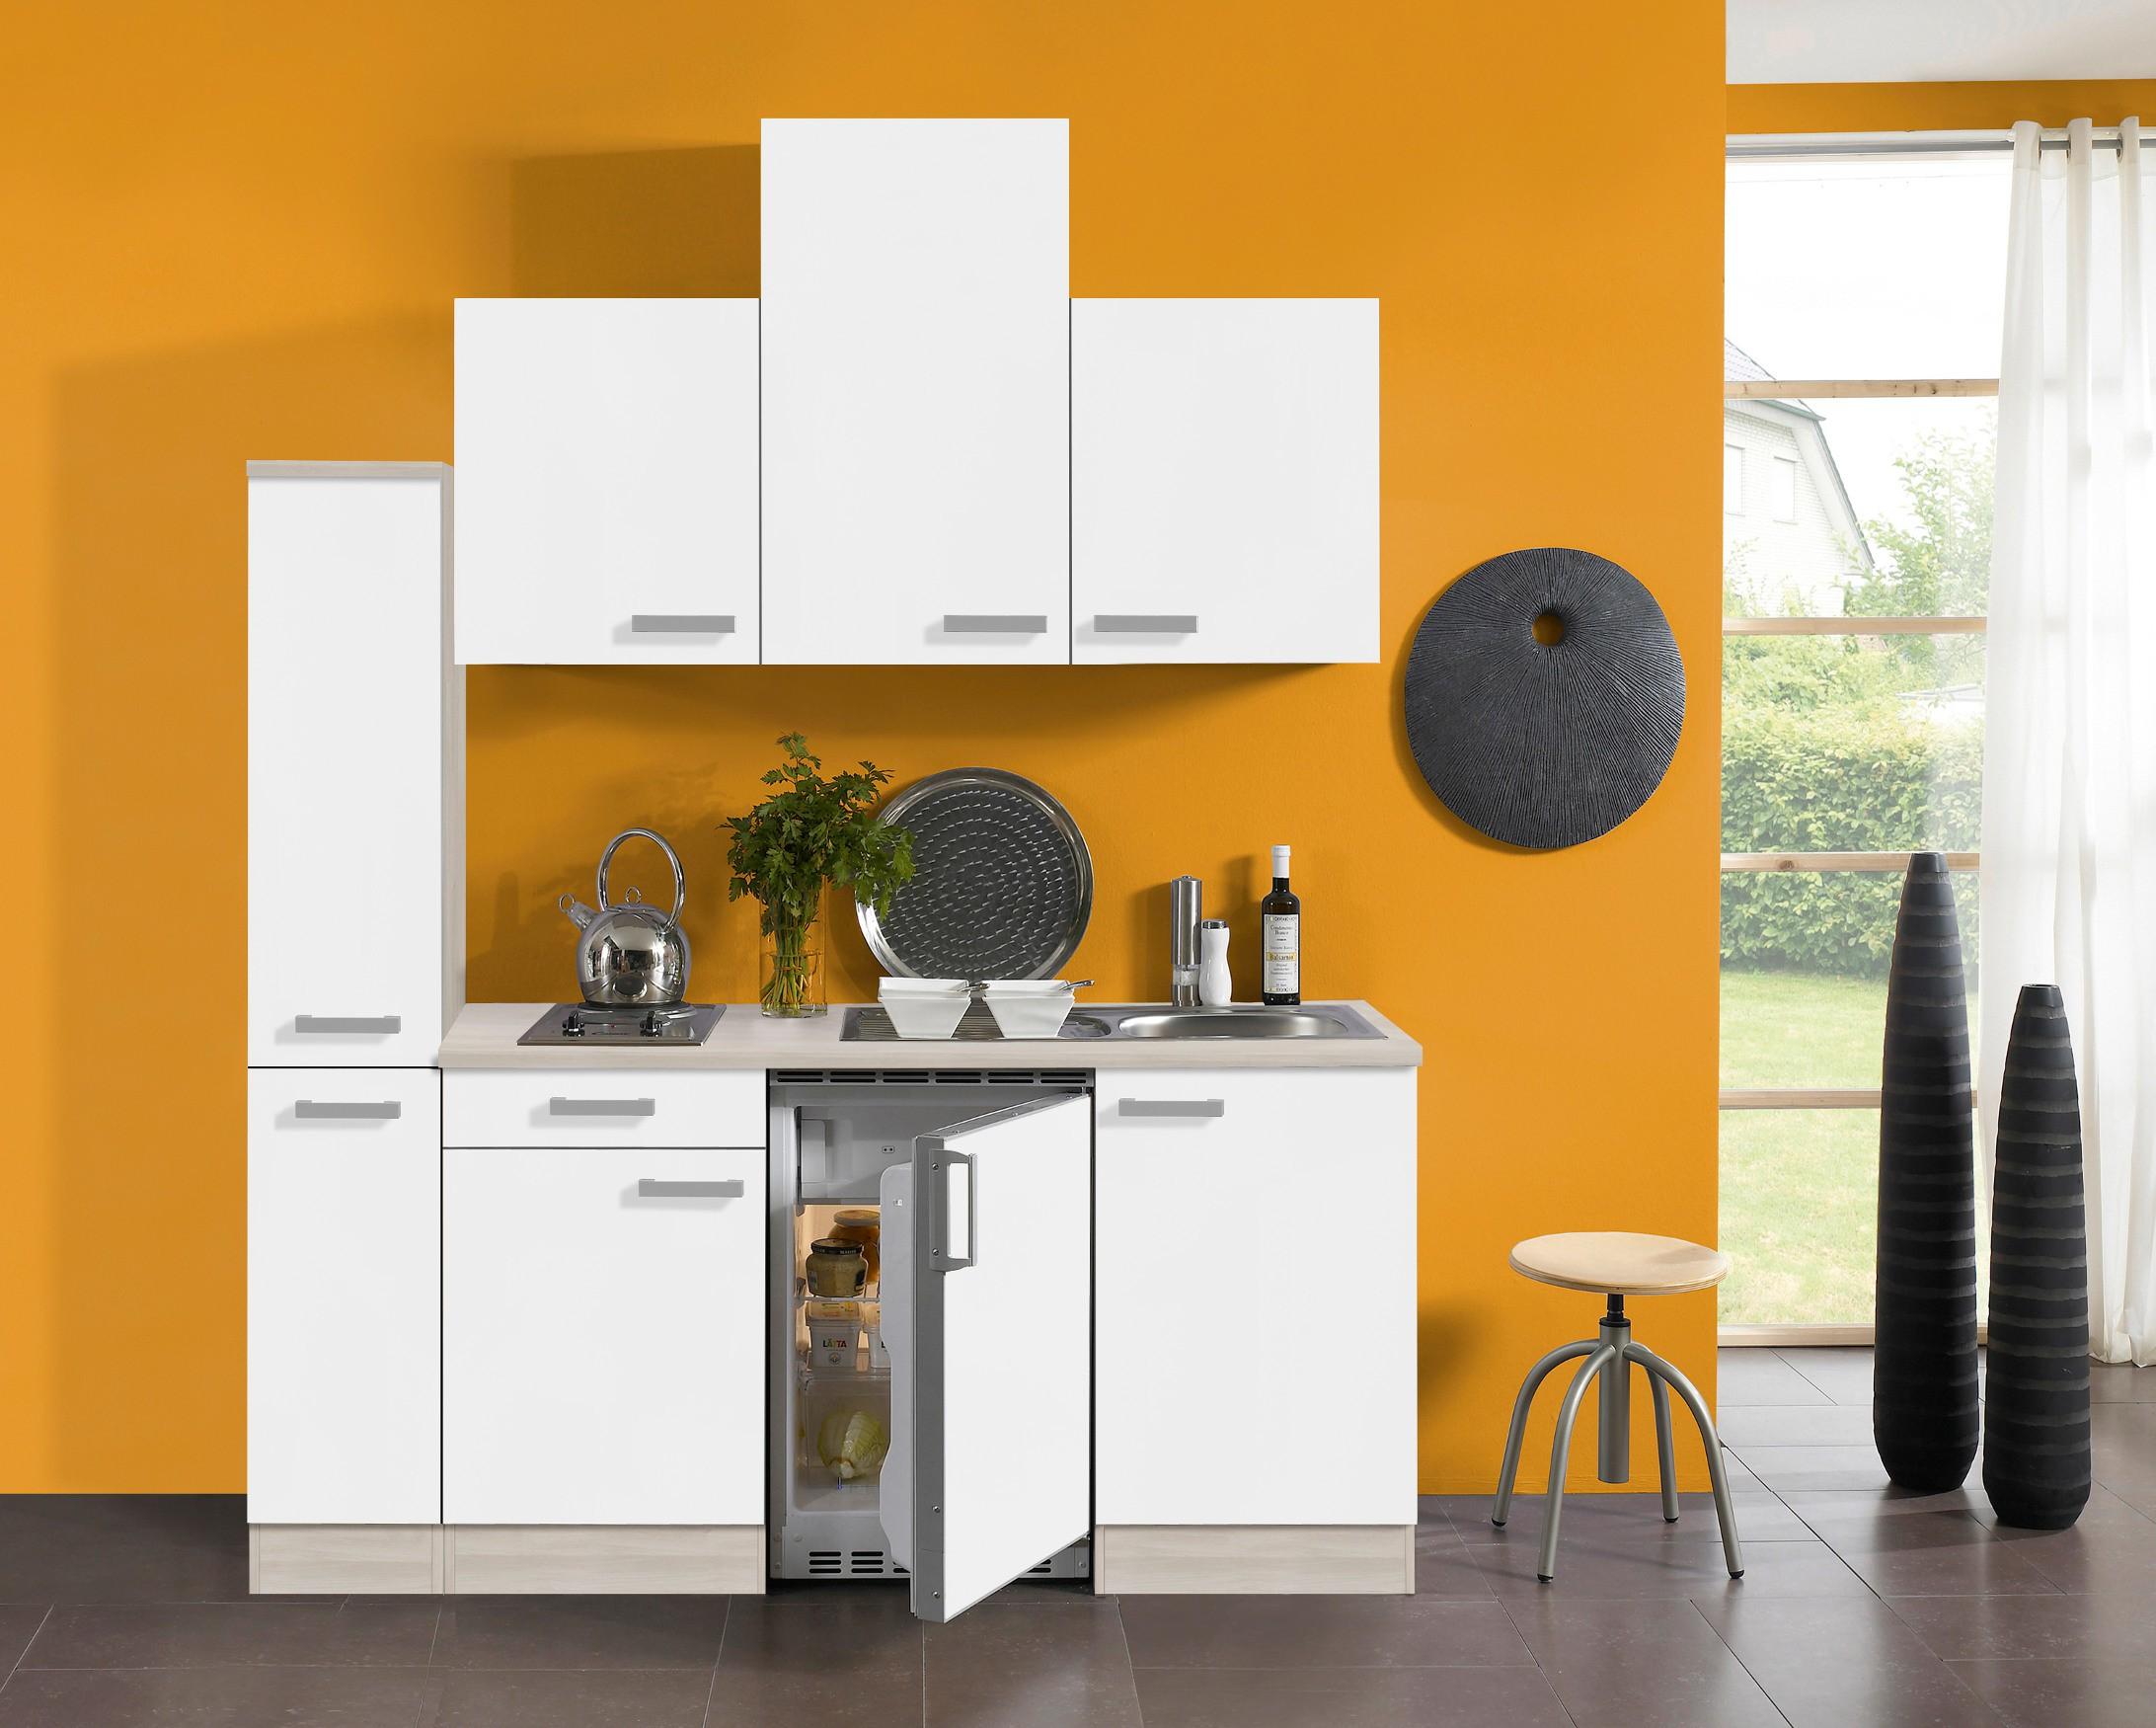 singlek che barcelona vario 2 mit elektro kochfeld breite 180 cm wei k che singlek chen. Black Bedroom Furniture Sets. Home Design Ideas